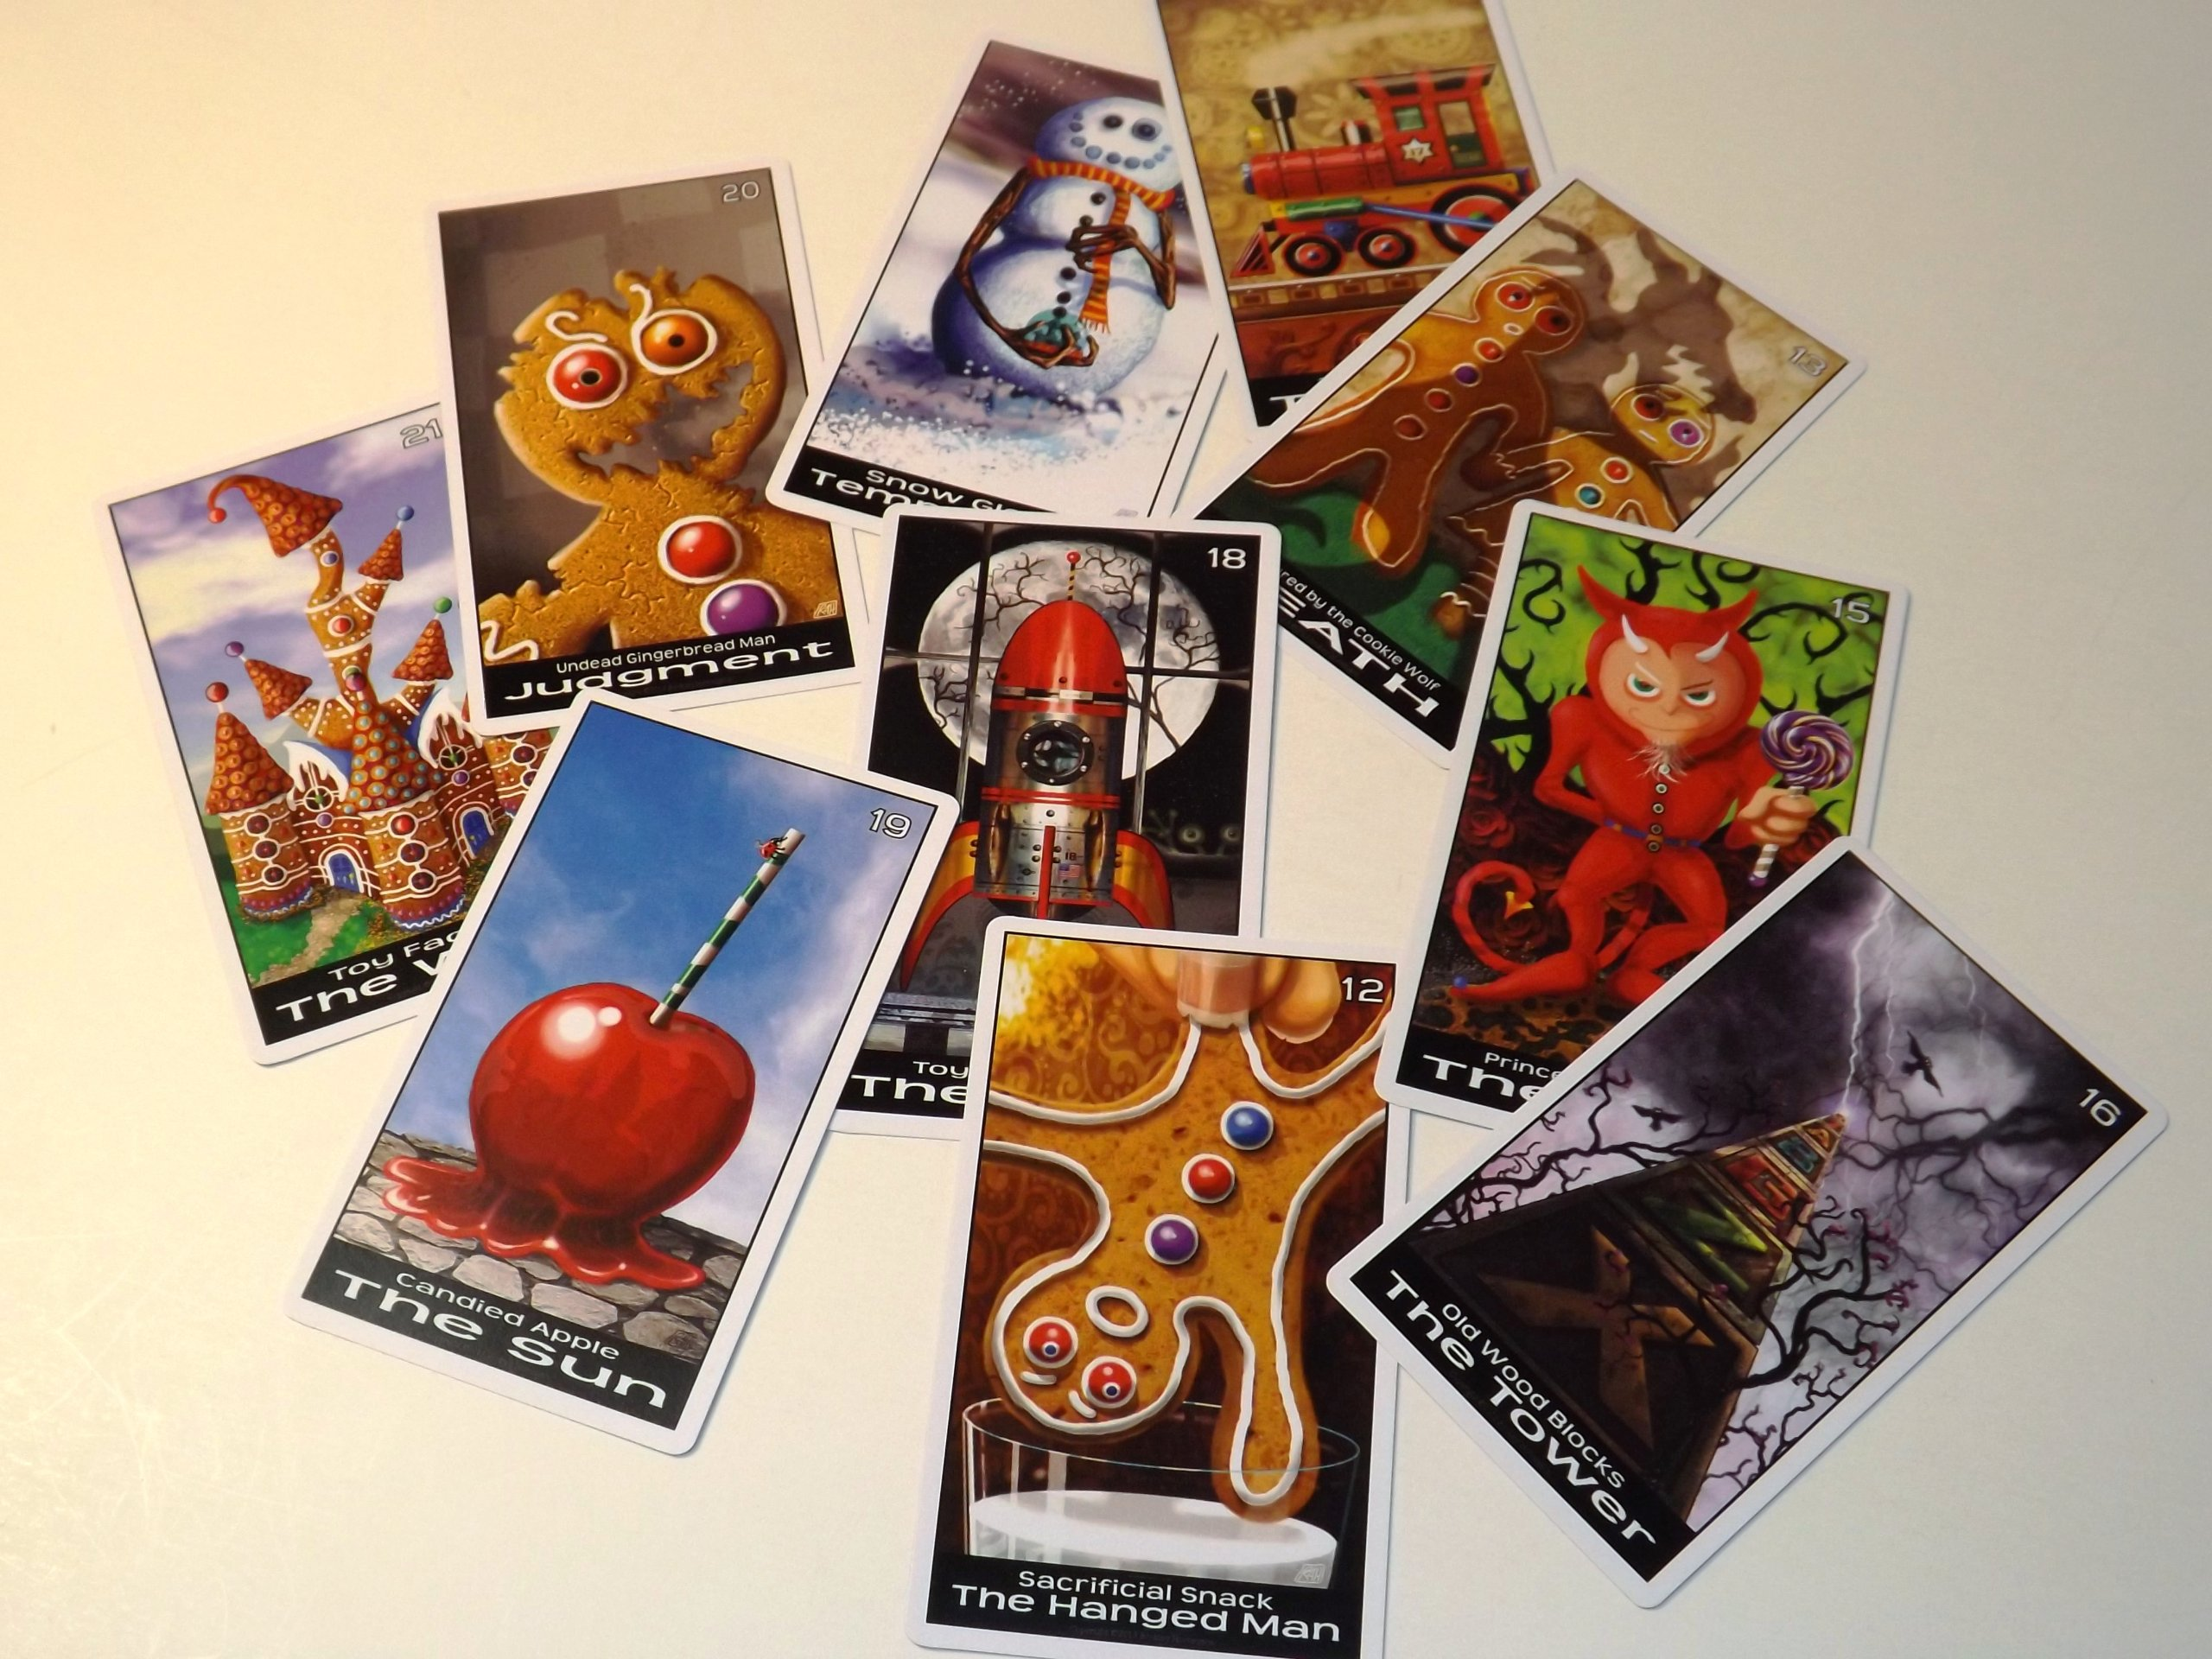 Twisted Toyland Tarot Cards - 22 Card Major Arcana Deck (With Handmade Tarot bag) by Oracles Forest Studios (Image #2)